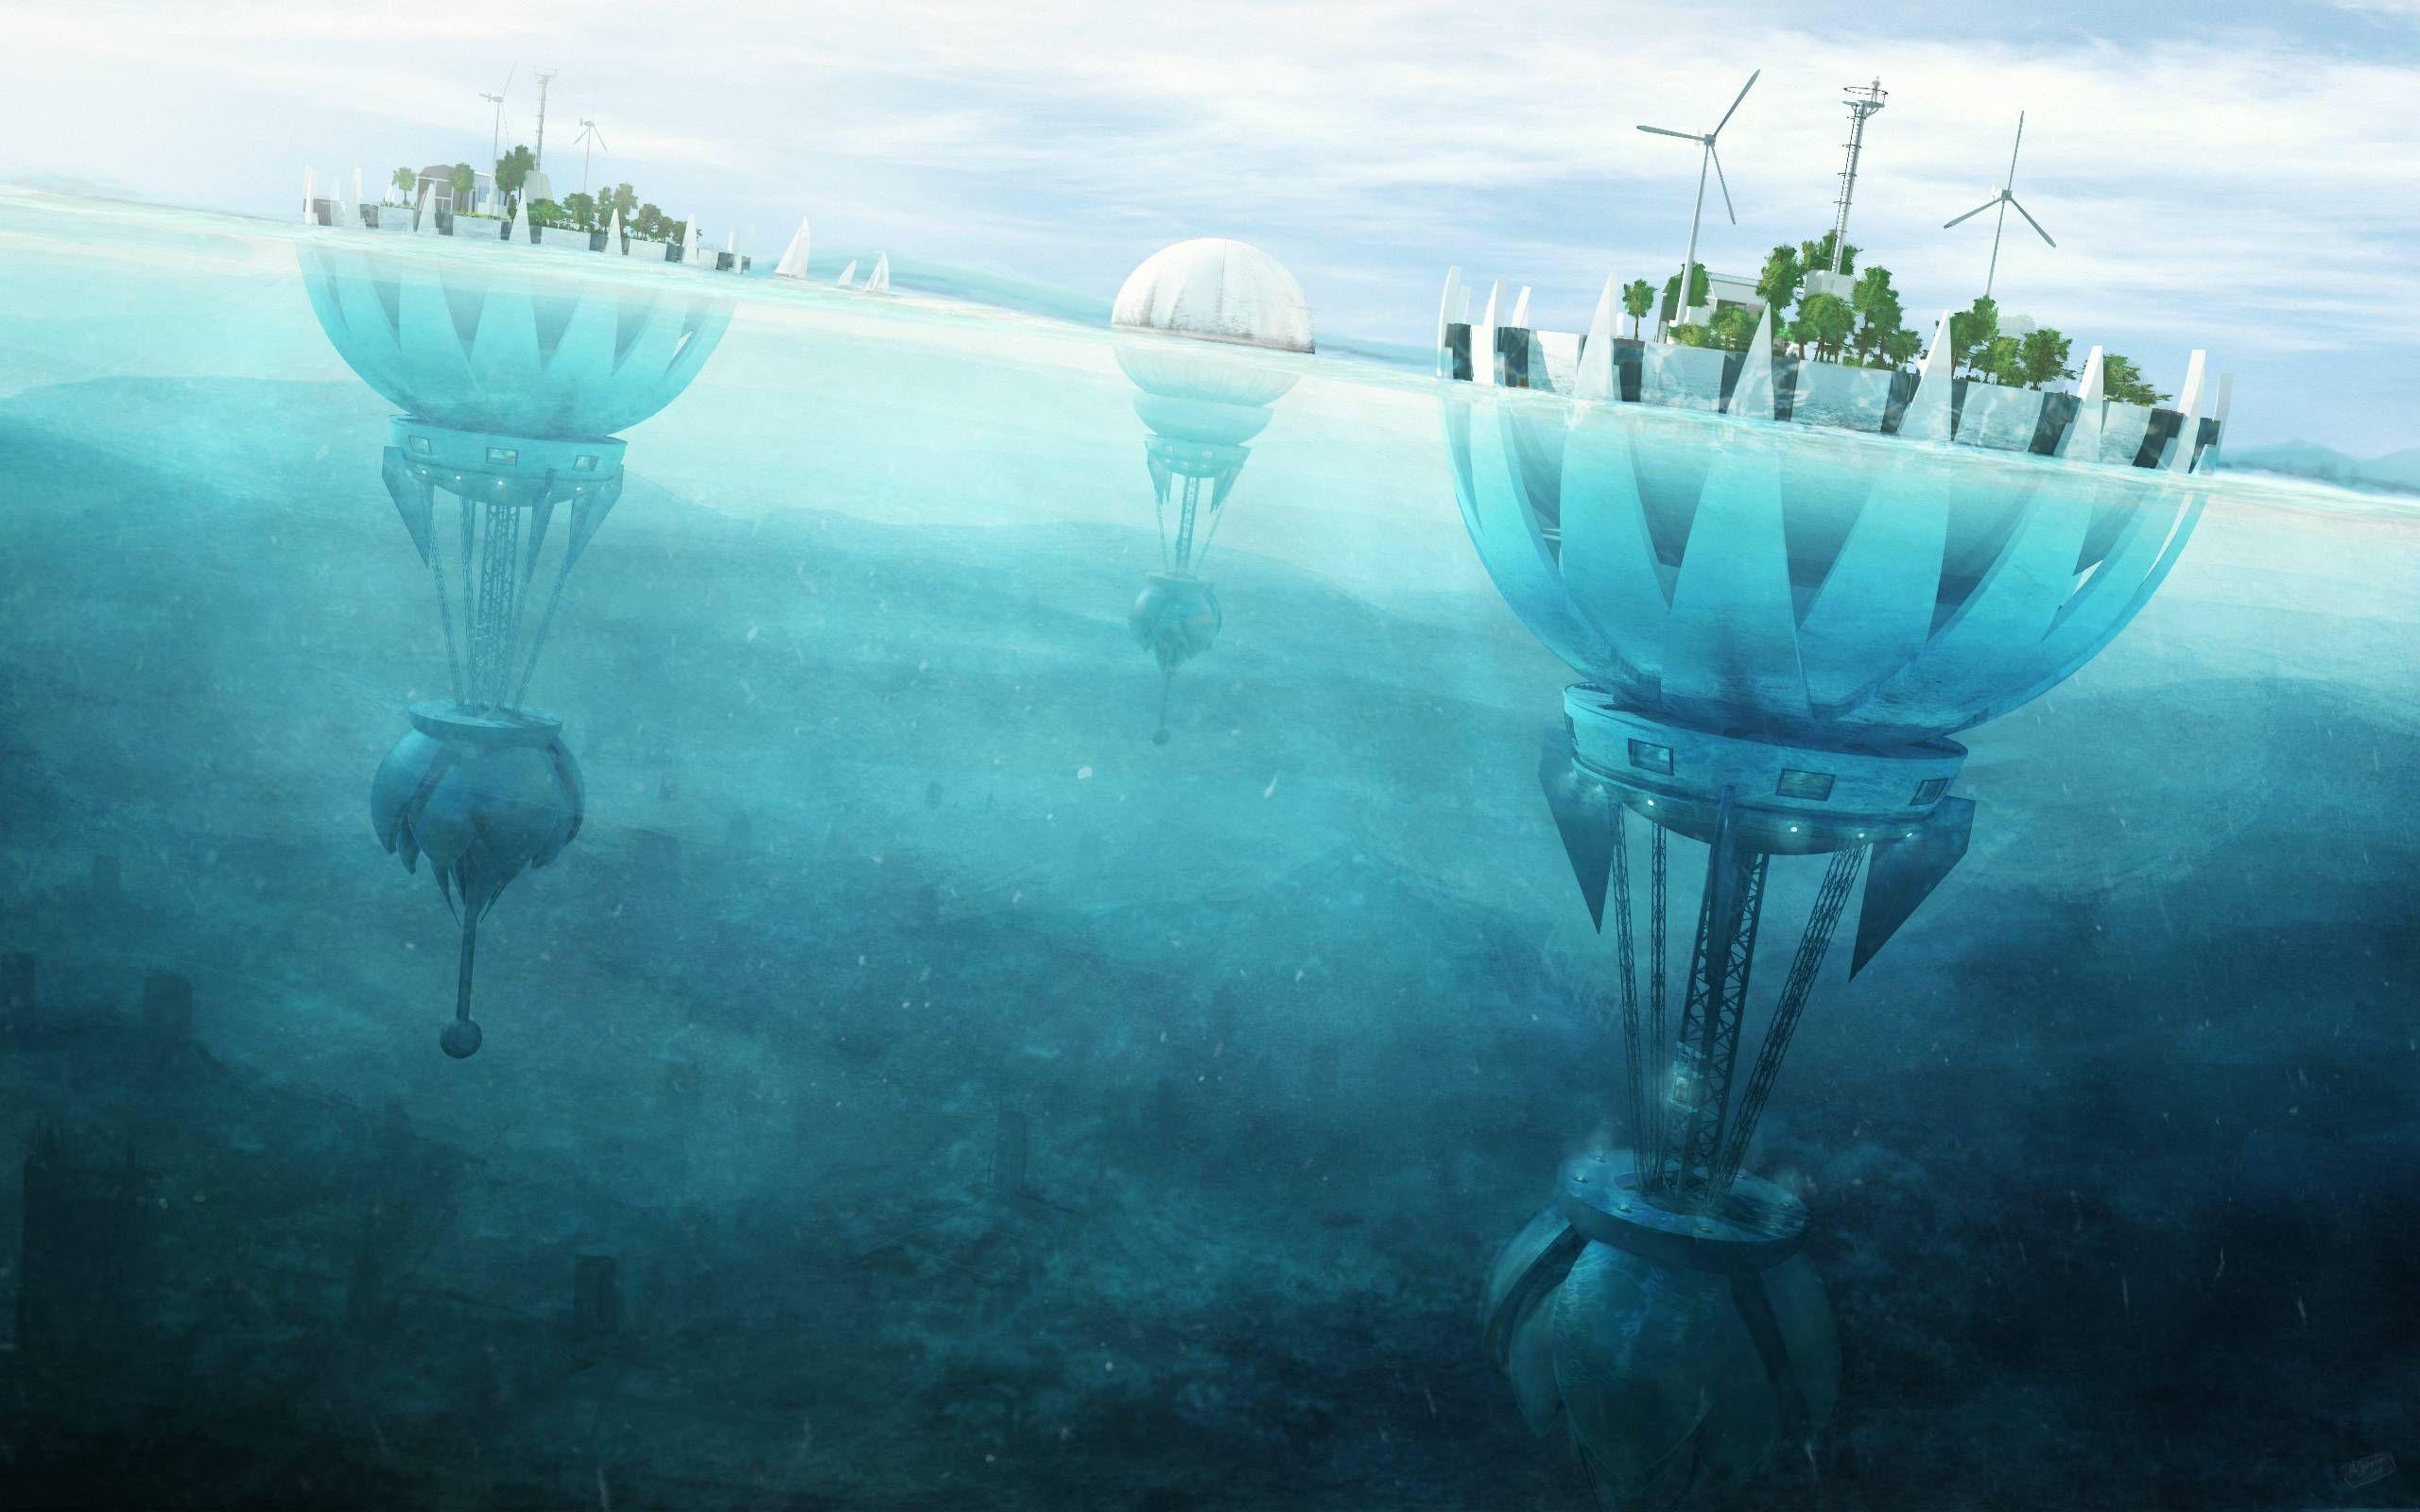 Water City Future Sea Artwork Architecture Underwater Science Fiction